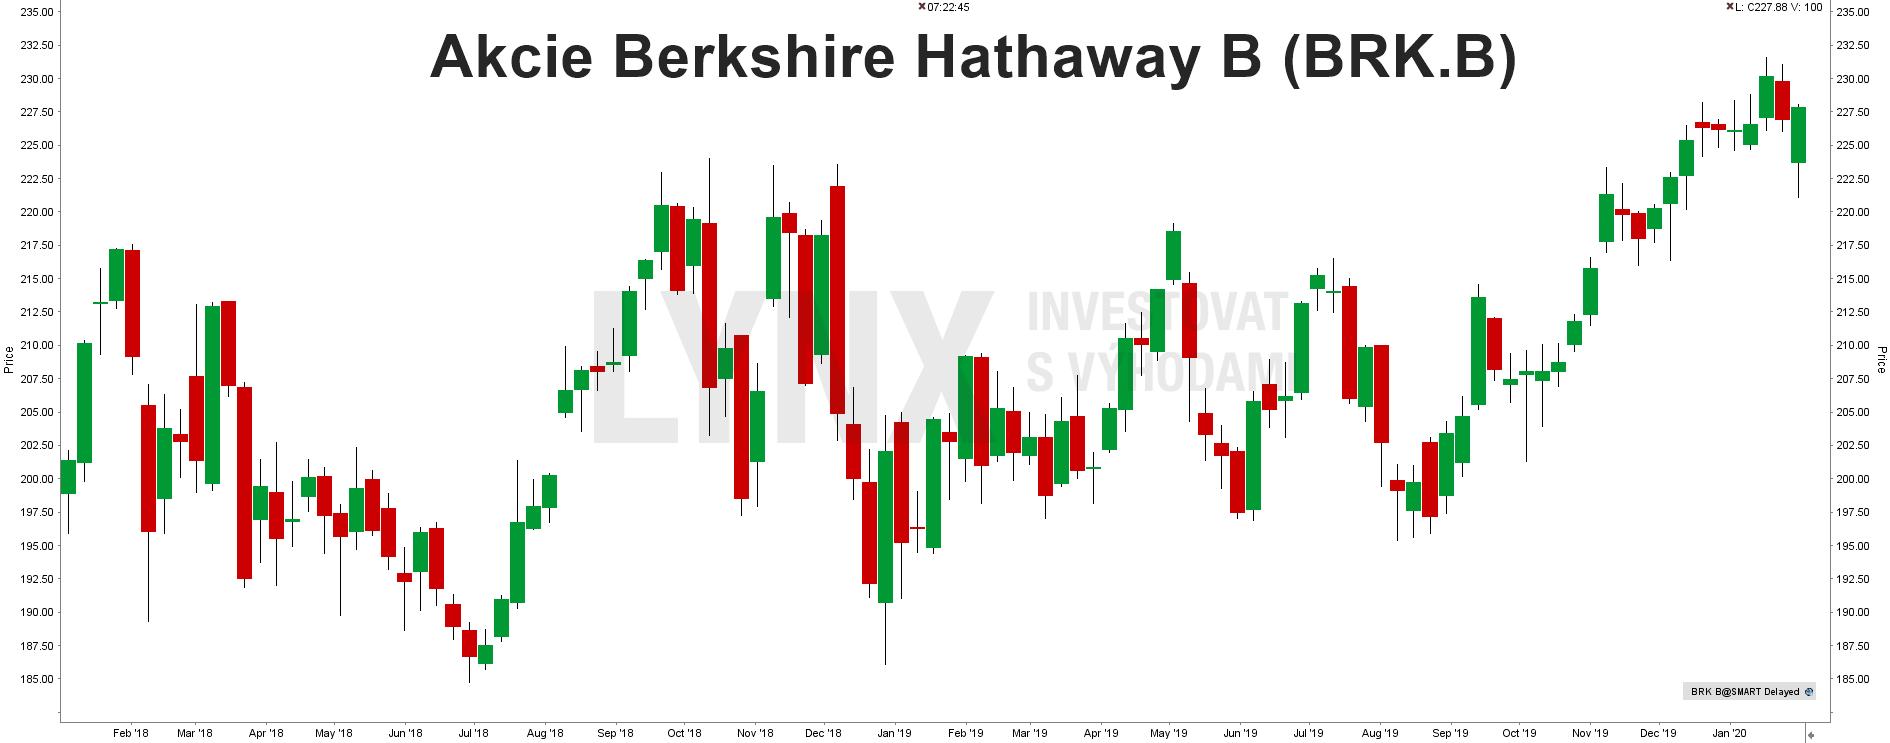 Akcie Berkshire Hathaway B